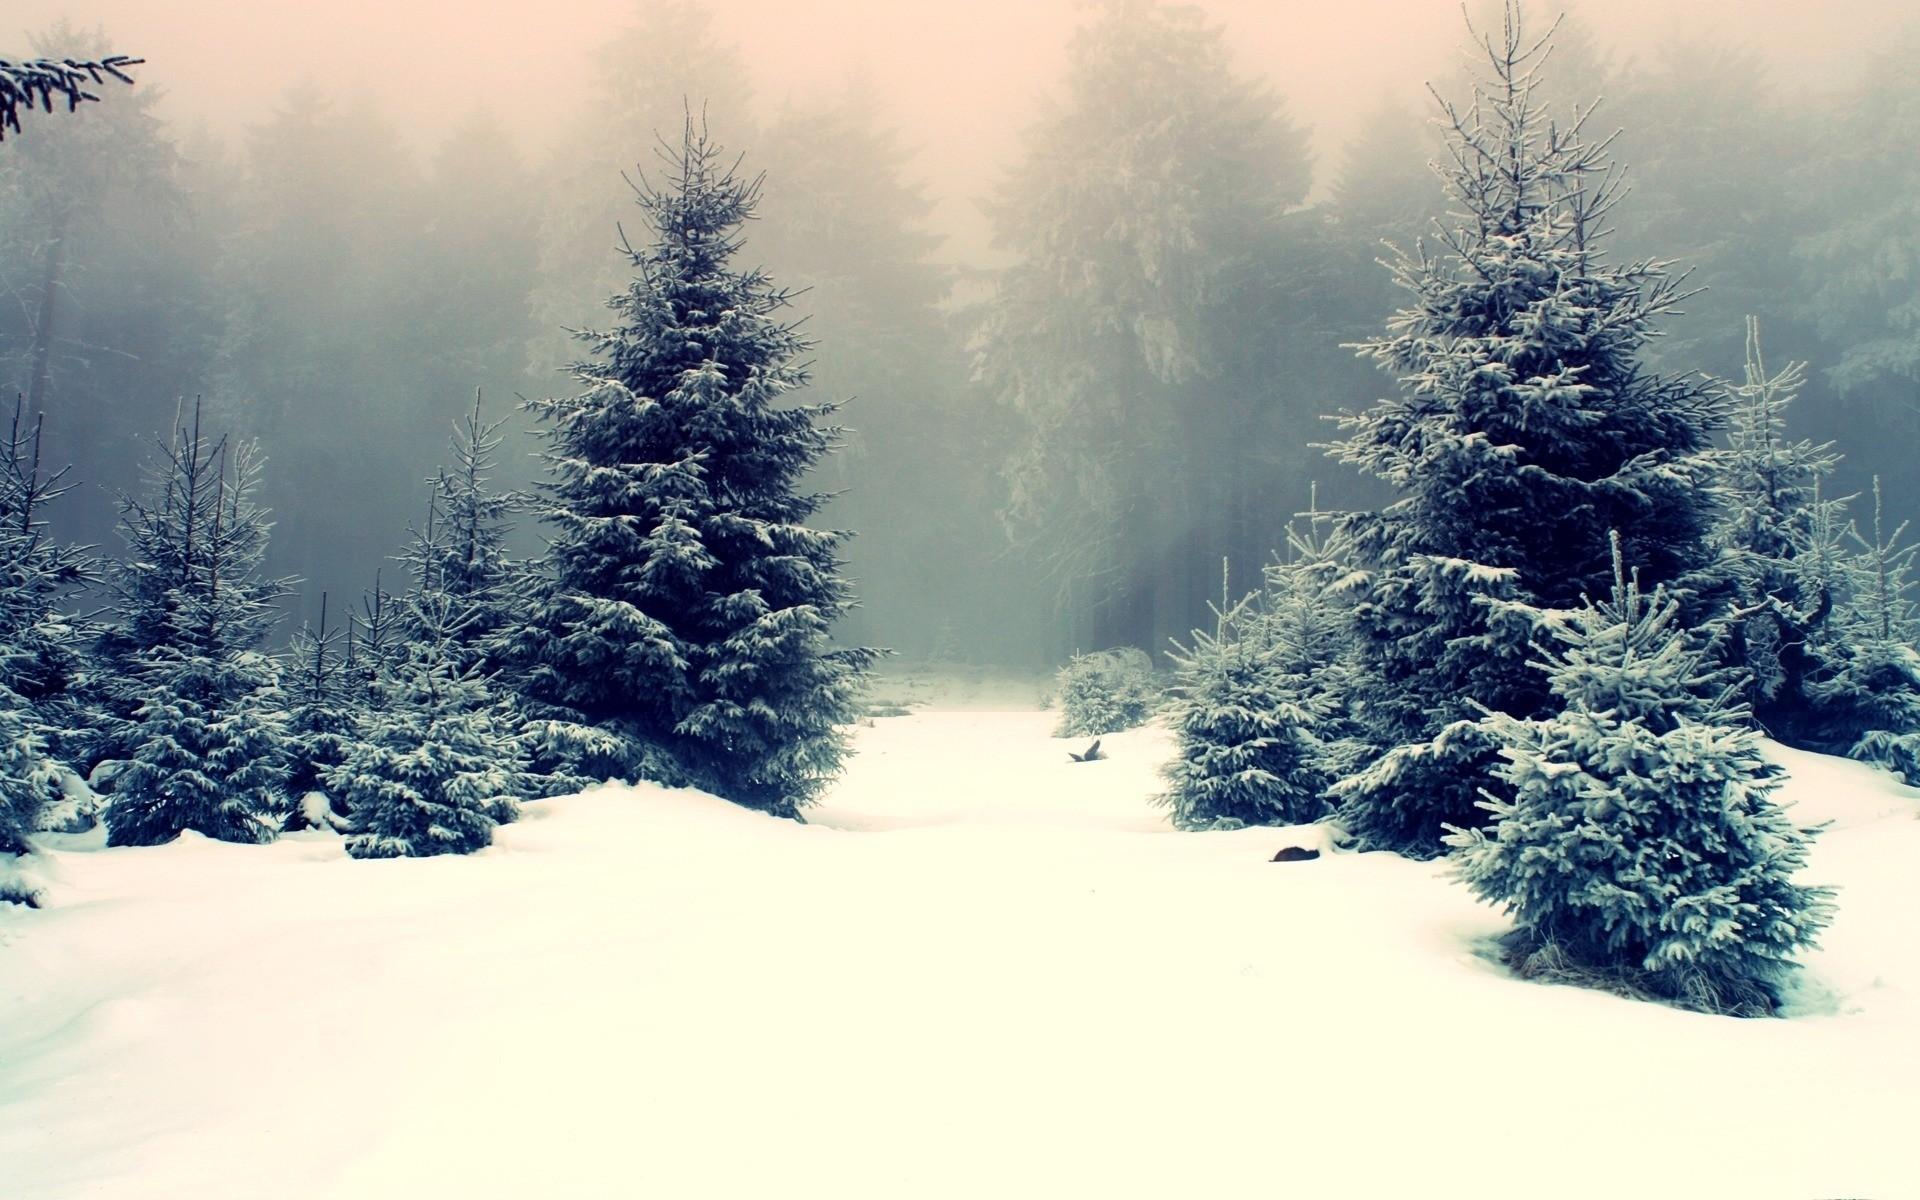 Winter Snow Wallpaper 1920x1200 Winter Snow Forest 1920x1200